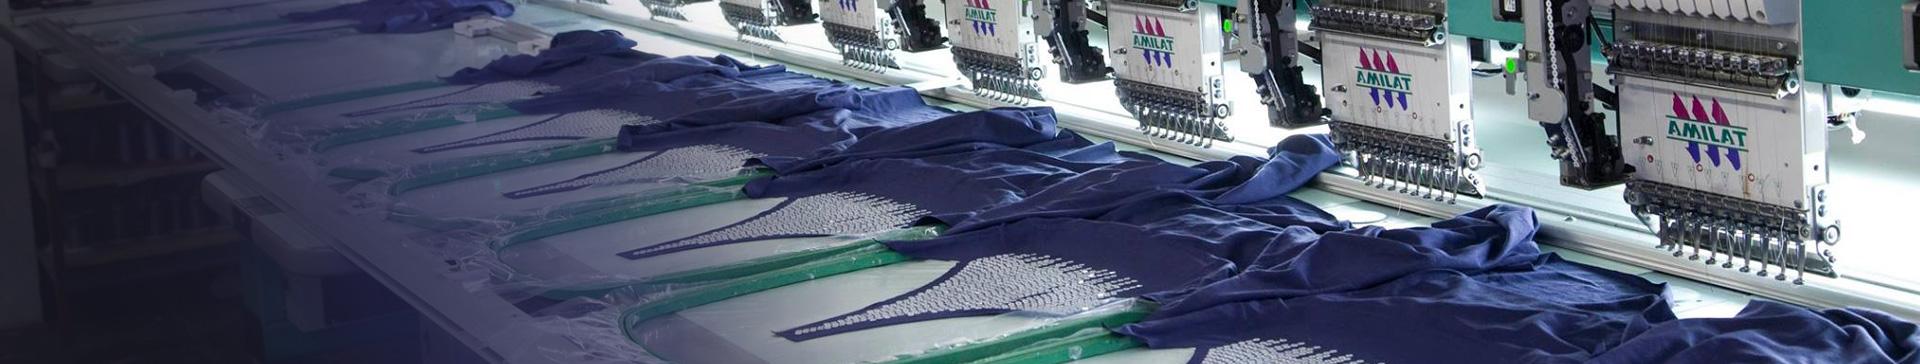 Camisetas no atacado   banner-bordado